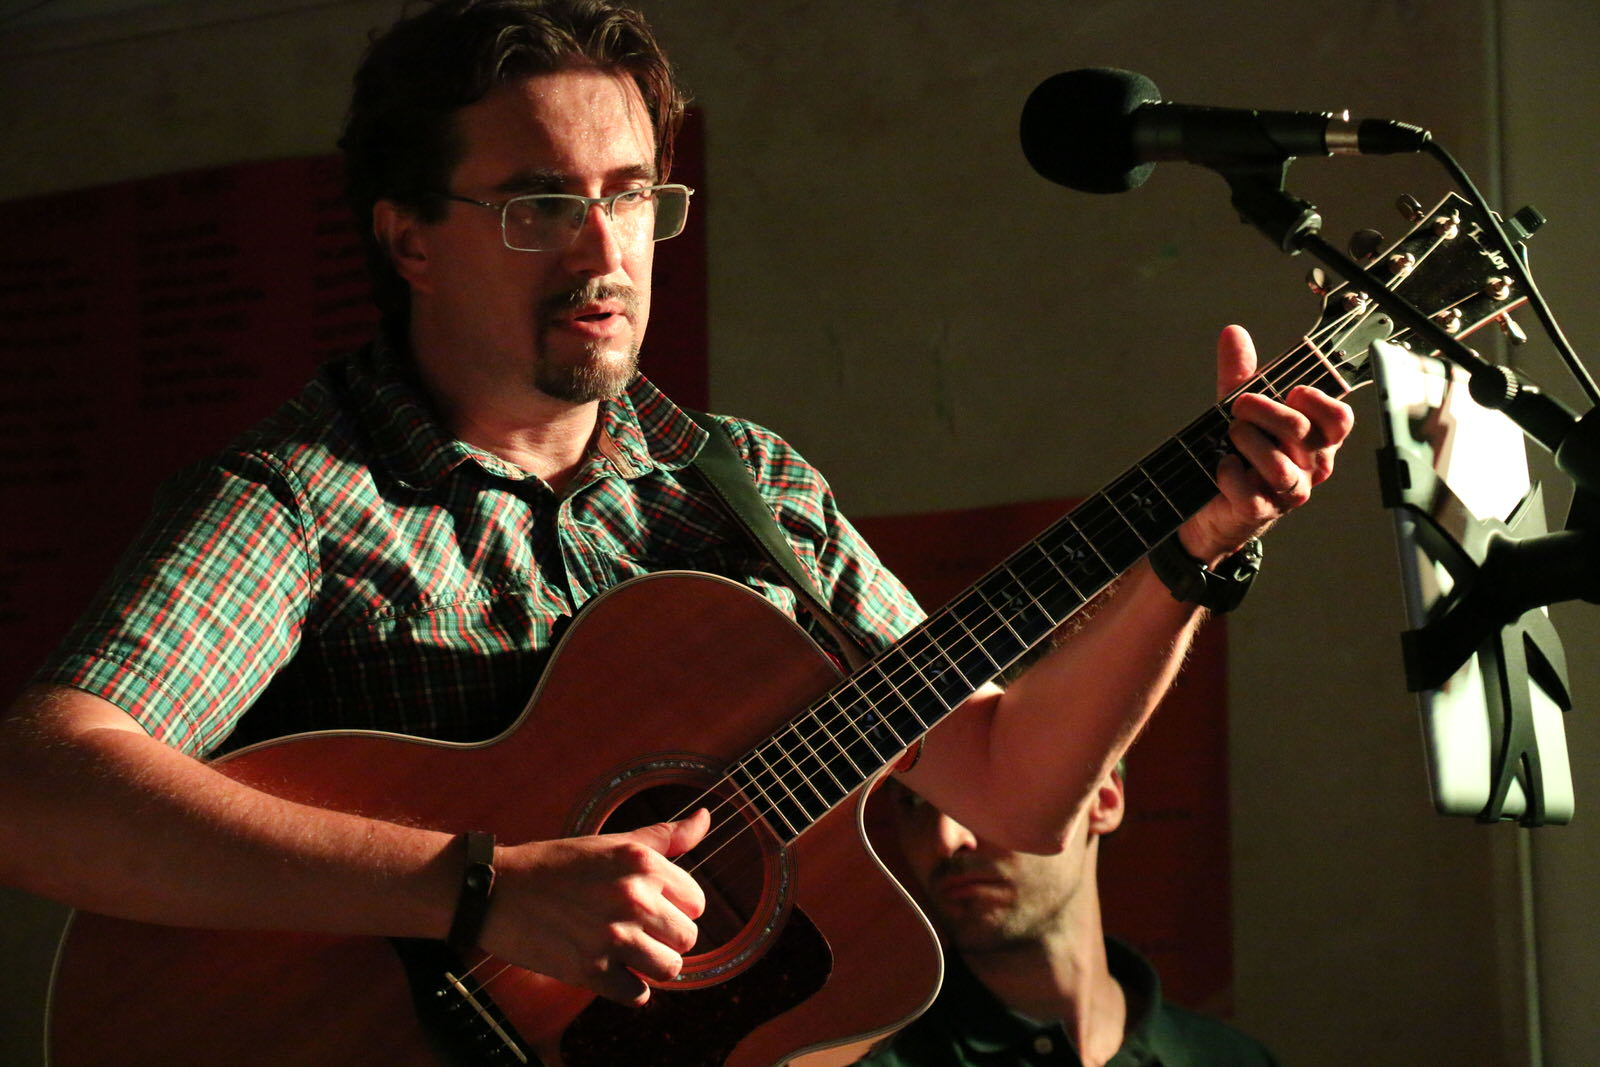 Roberto Frugone Band in concerto acustico a Barbagelata 2016.07.19